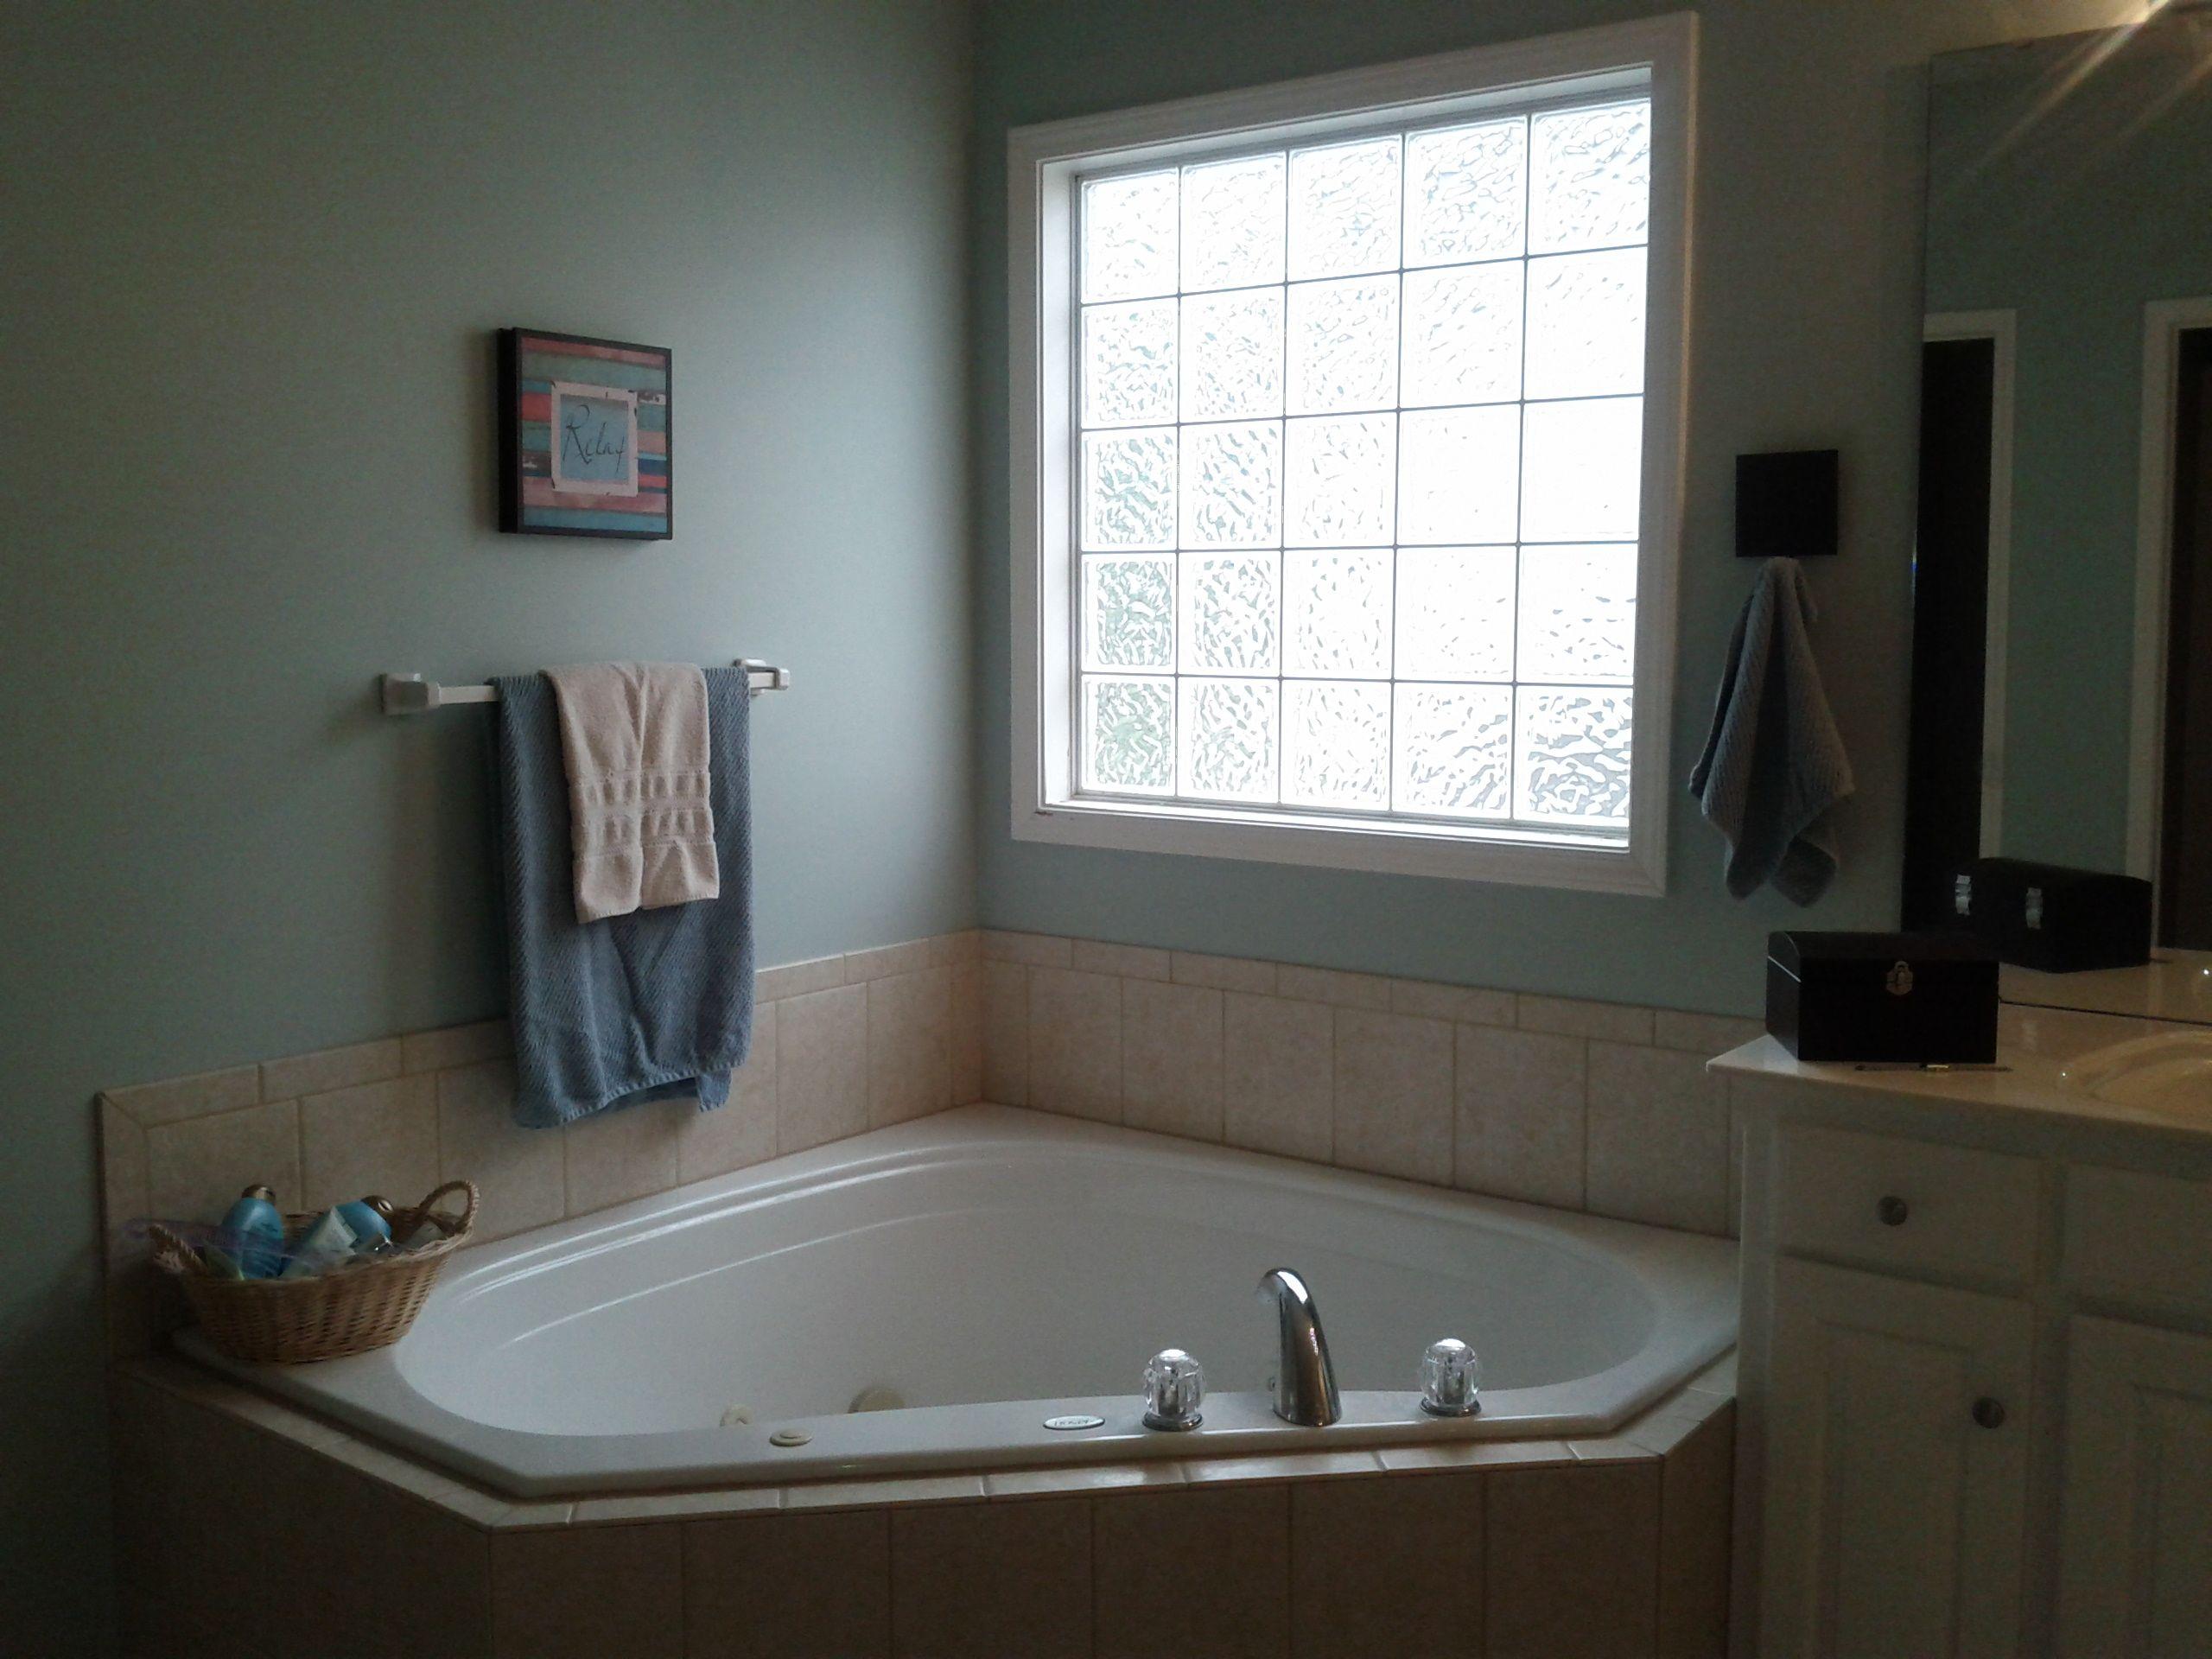 Sherwin Williams  Copen Blue In My Master Bathroom Love